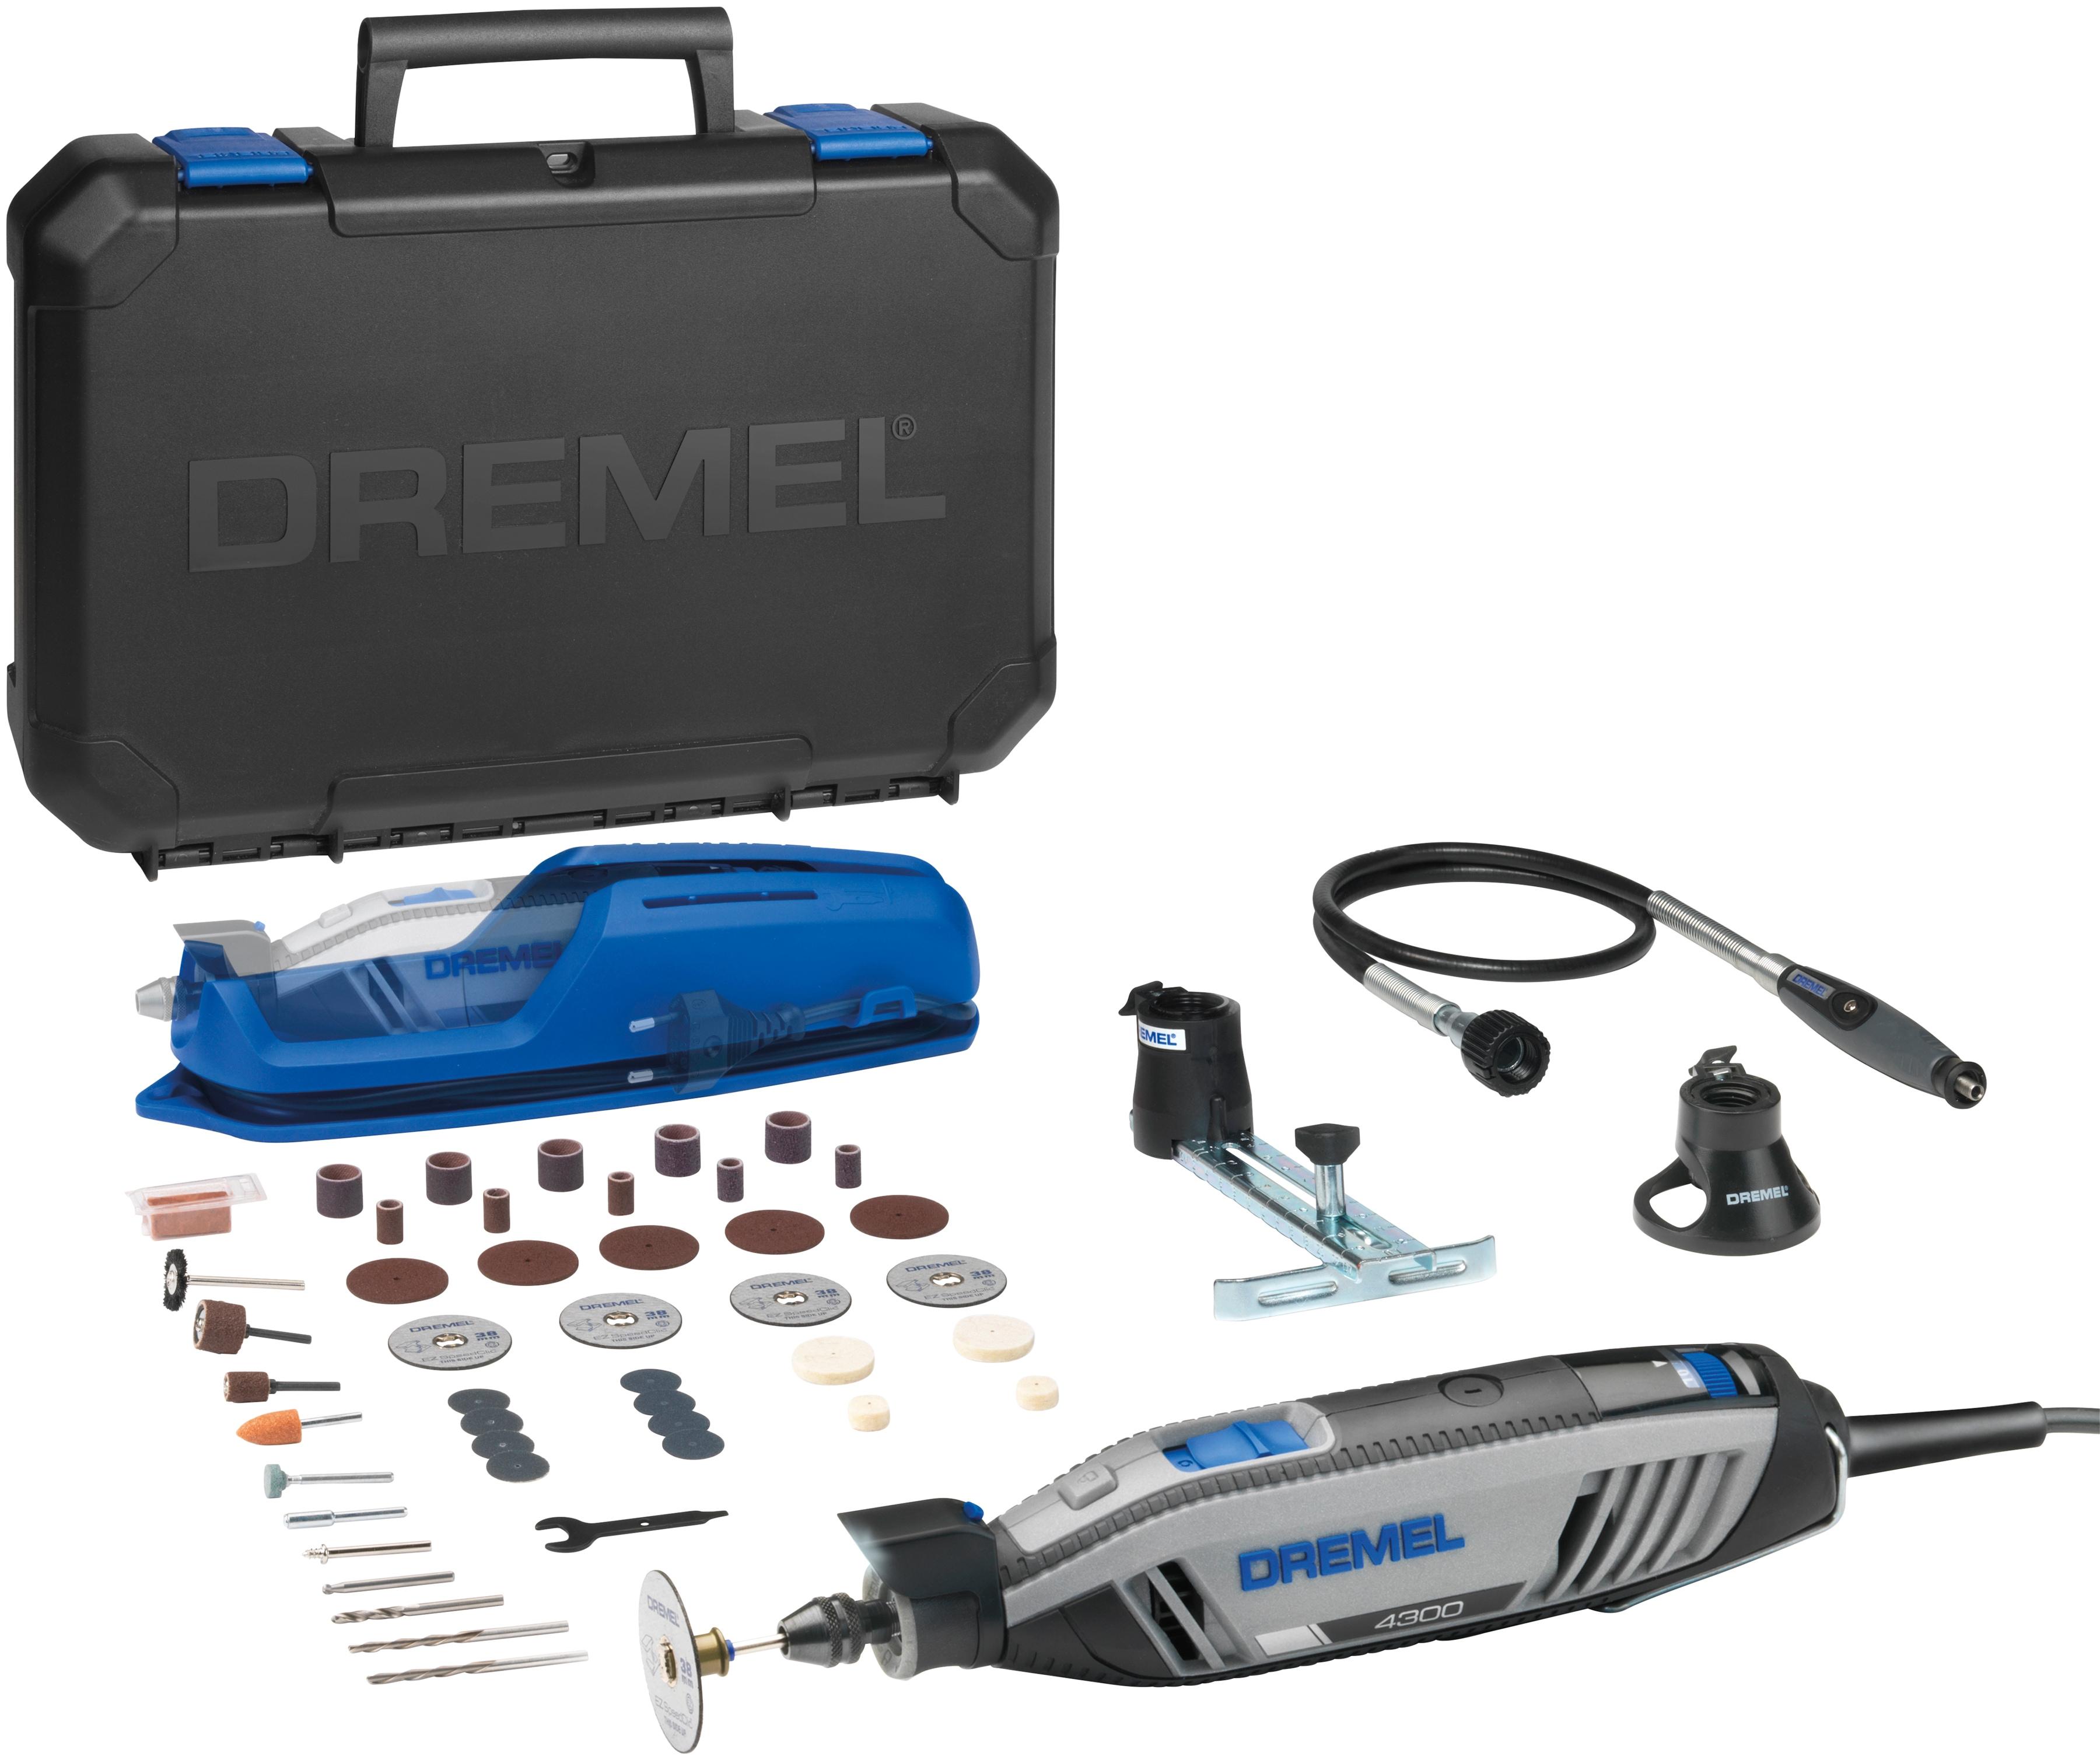 DREMEL Elektro-Multifunktionswerkzeug 4300-3/45 grau Multifunktionswerkzeug Werkzeug Maschinen